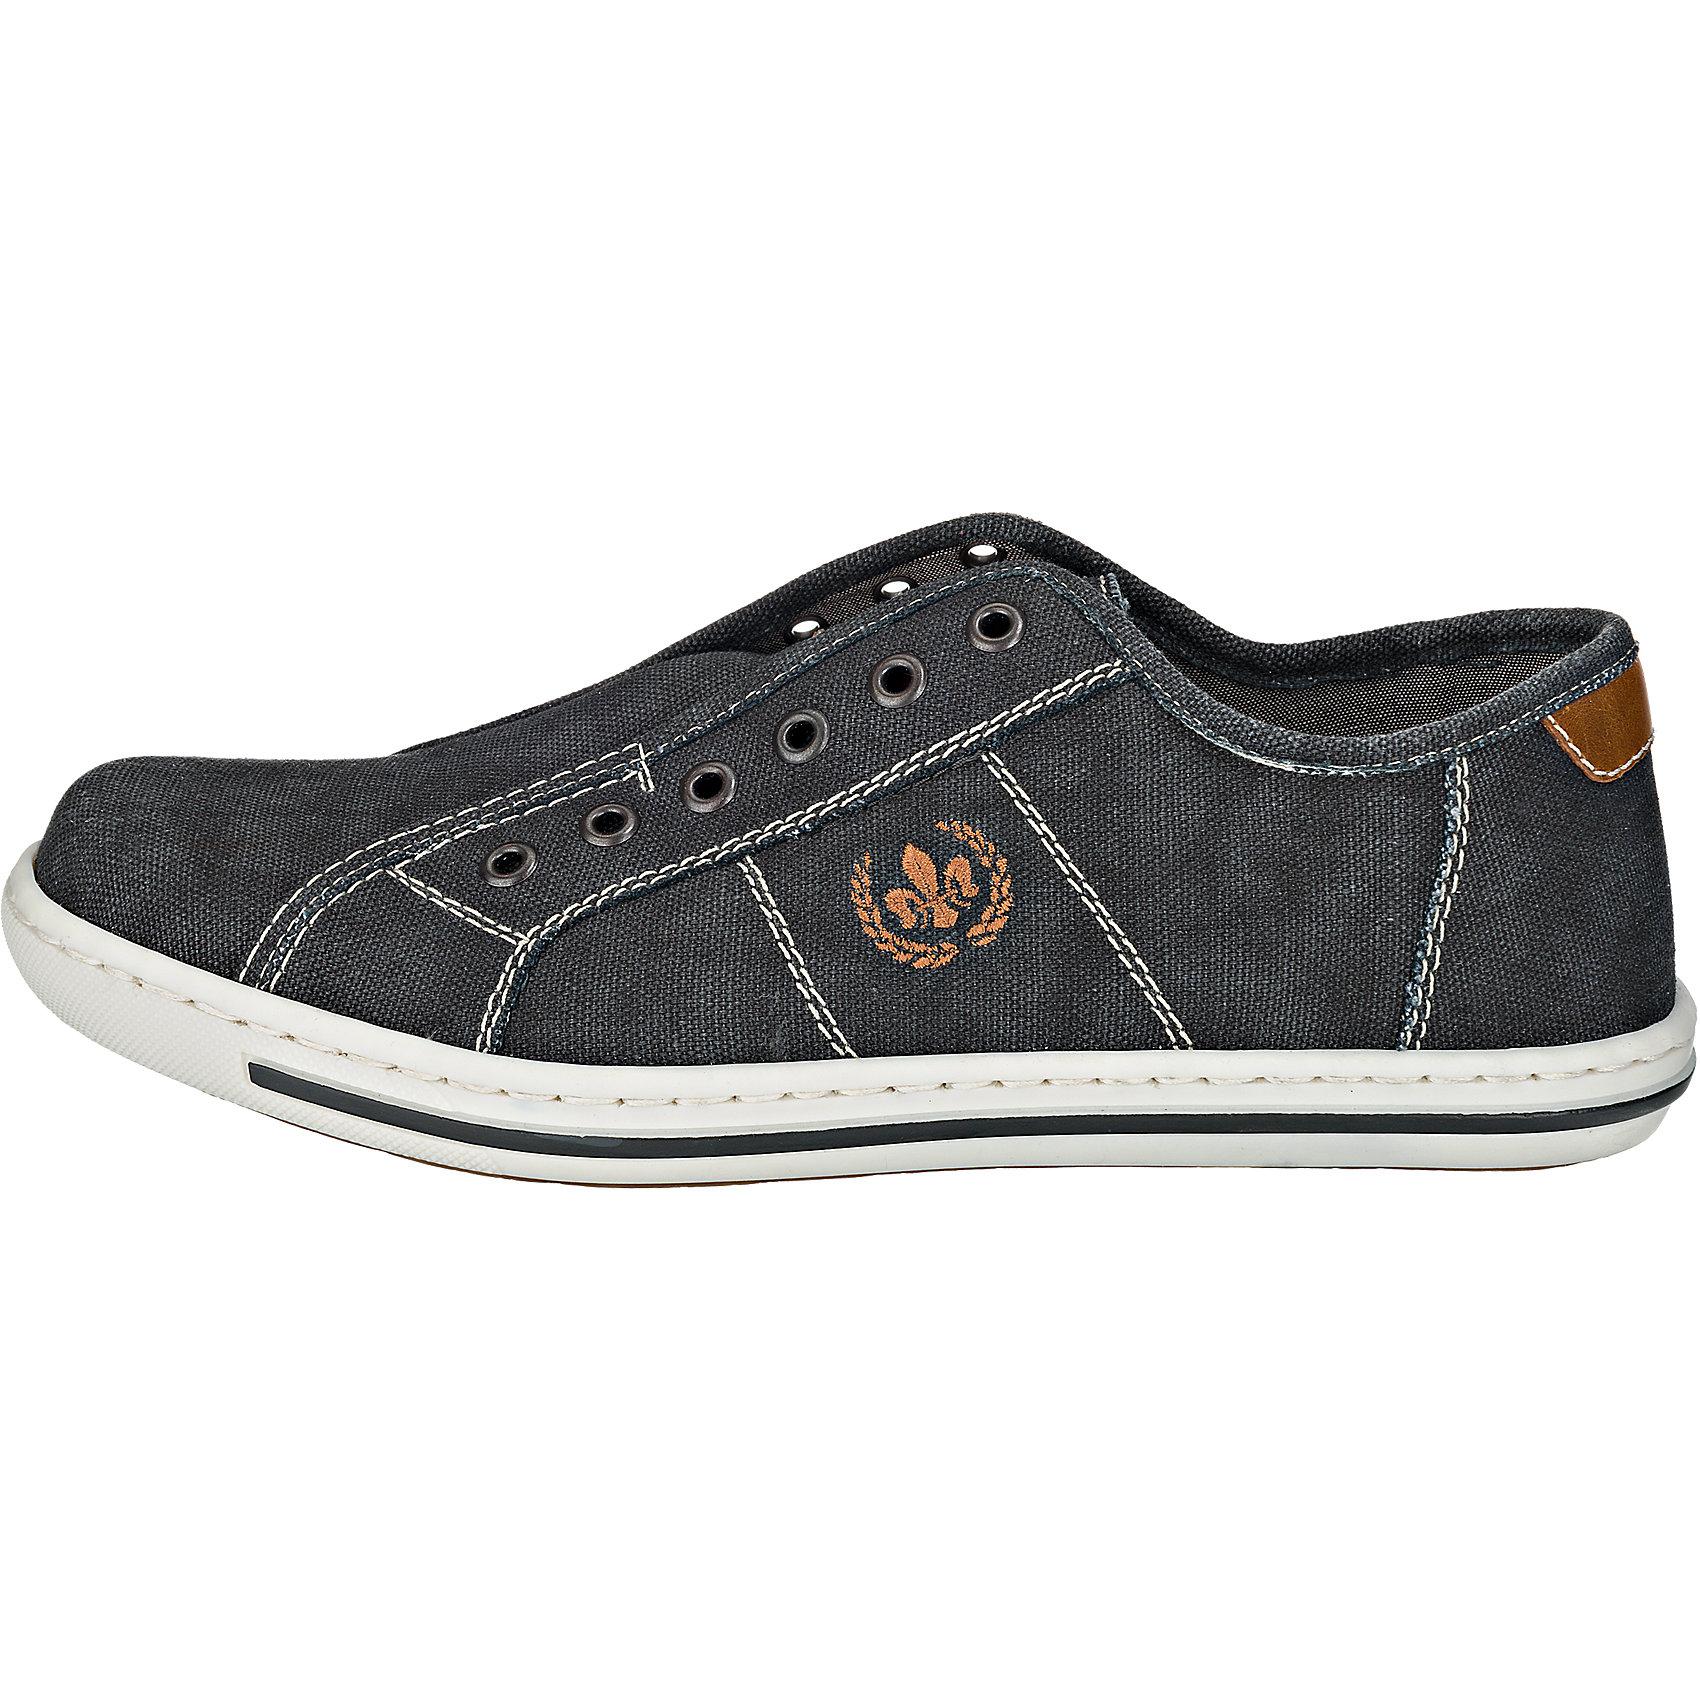 Neu rieker Sneakers grau-kombi 5768756